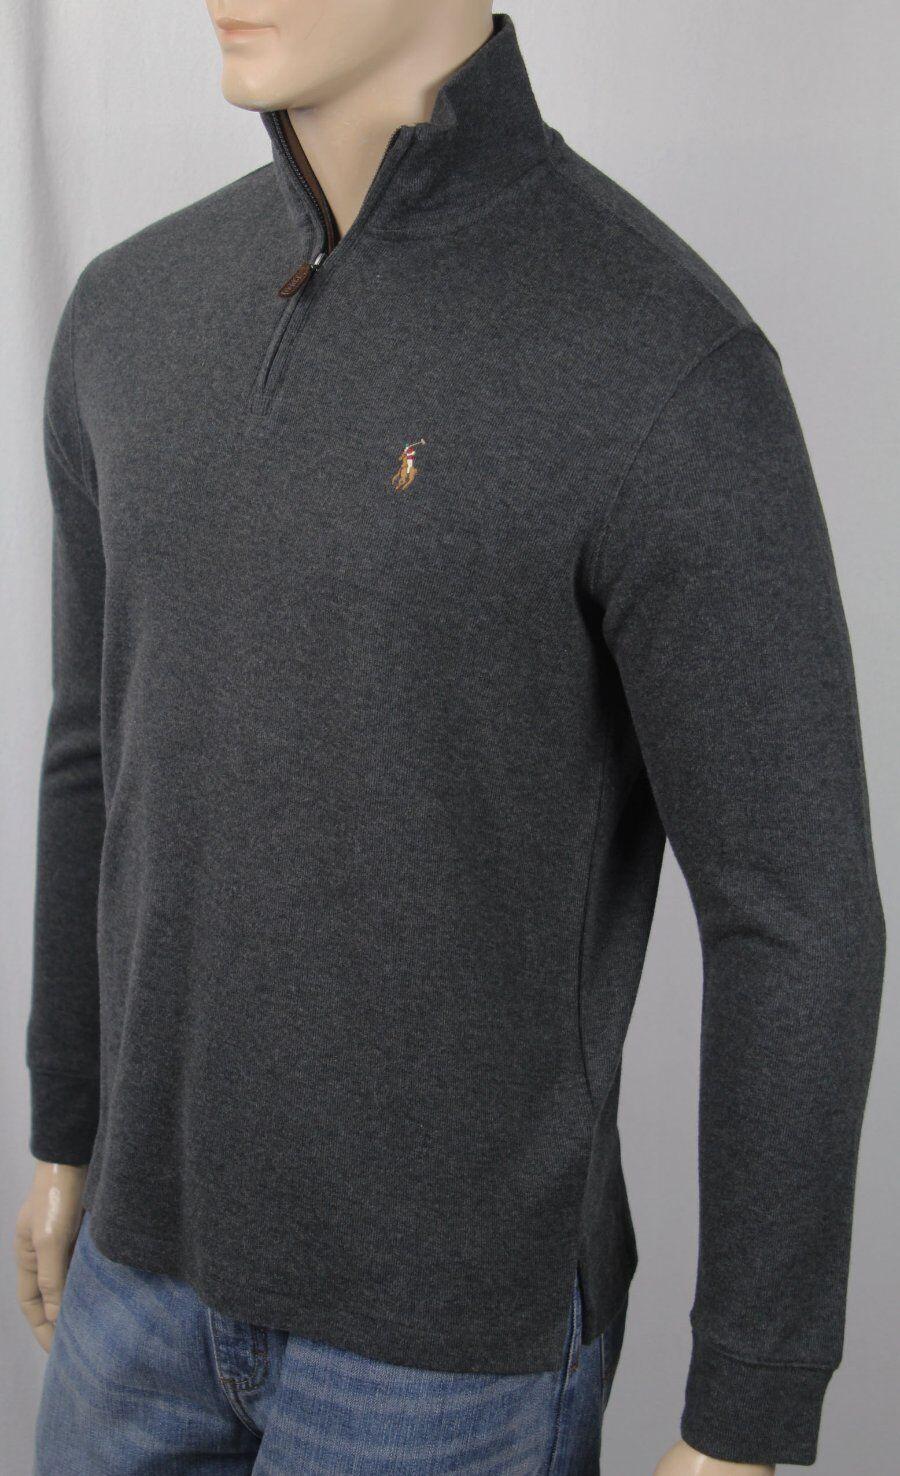 Polo Ralph Lauren Dark Grey Estate Rib Half Zip Sweater Multi color Pony NWT